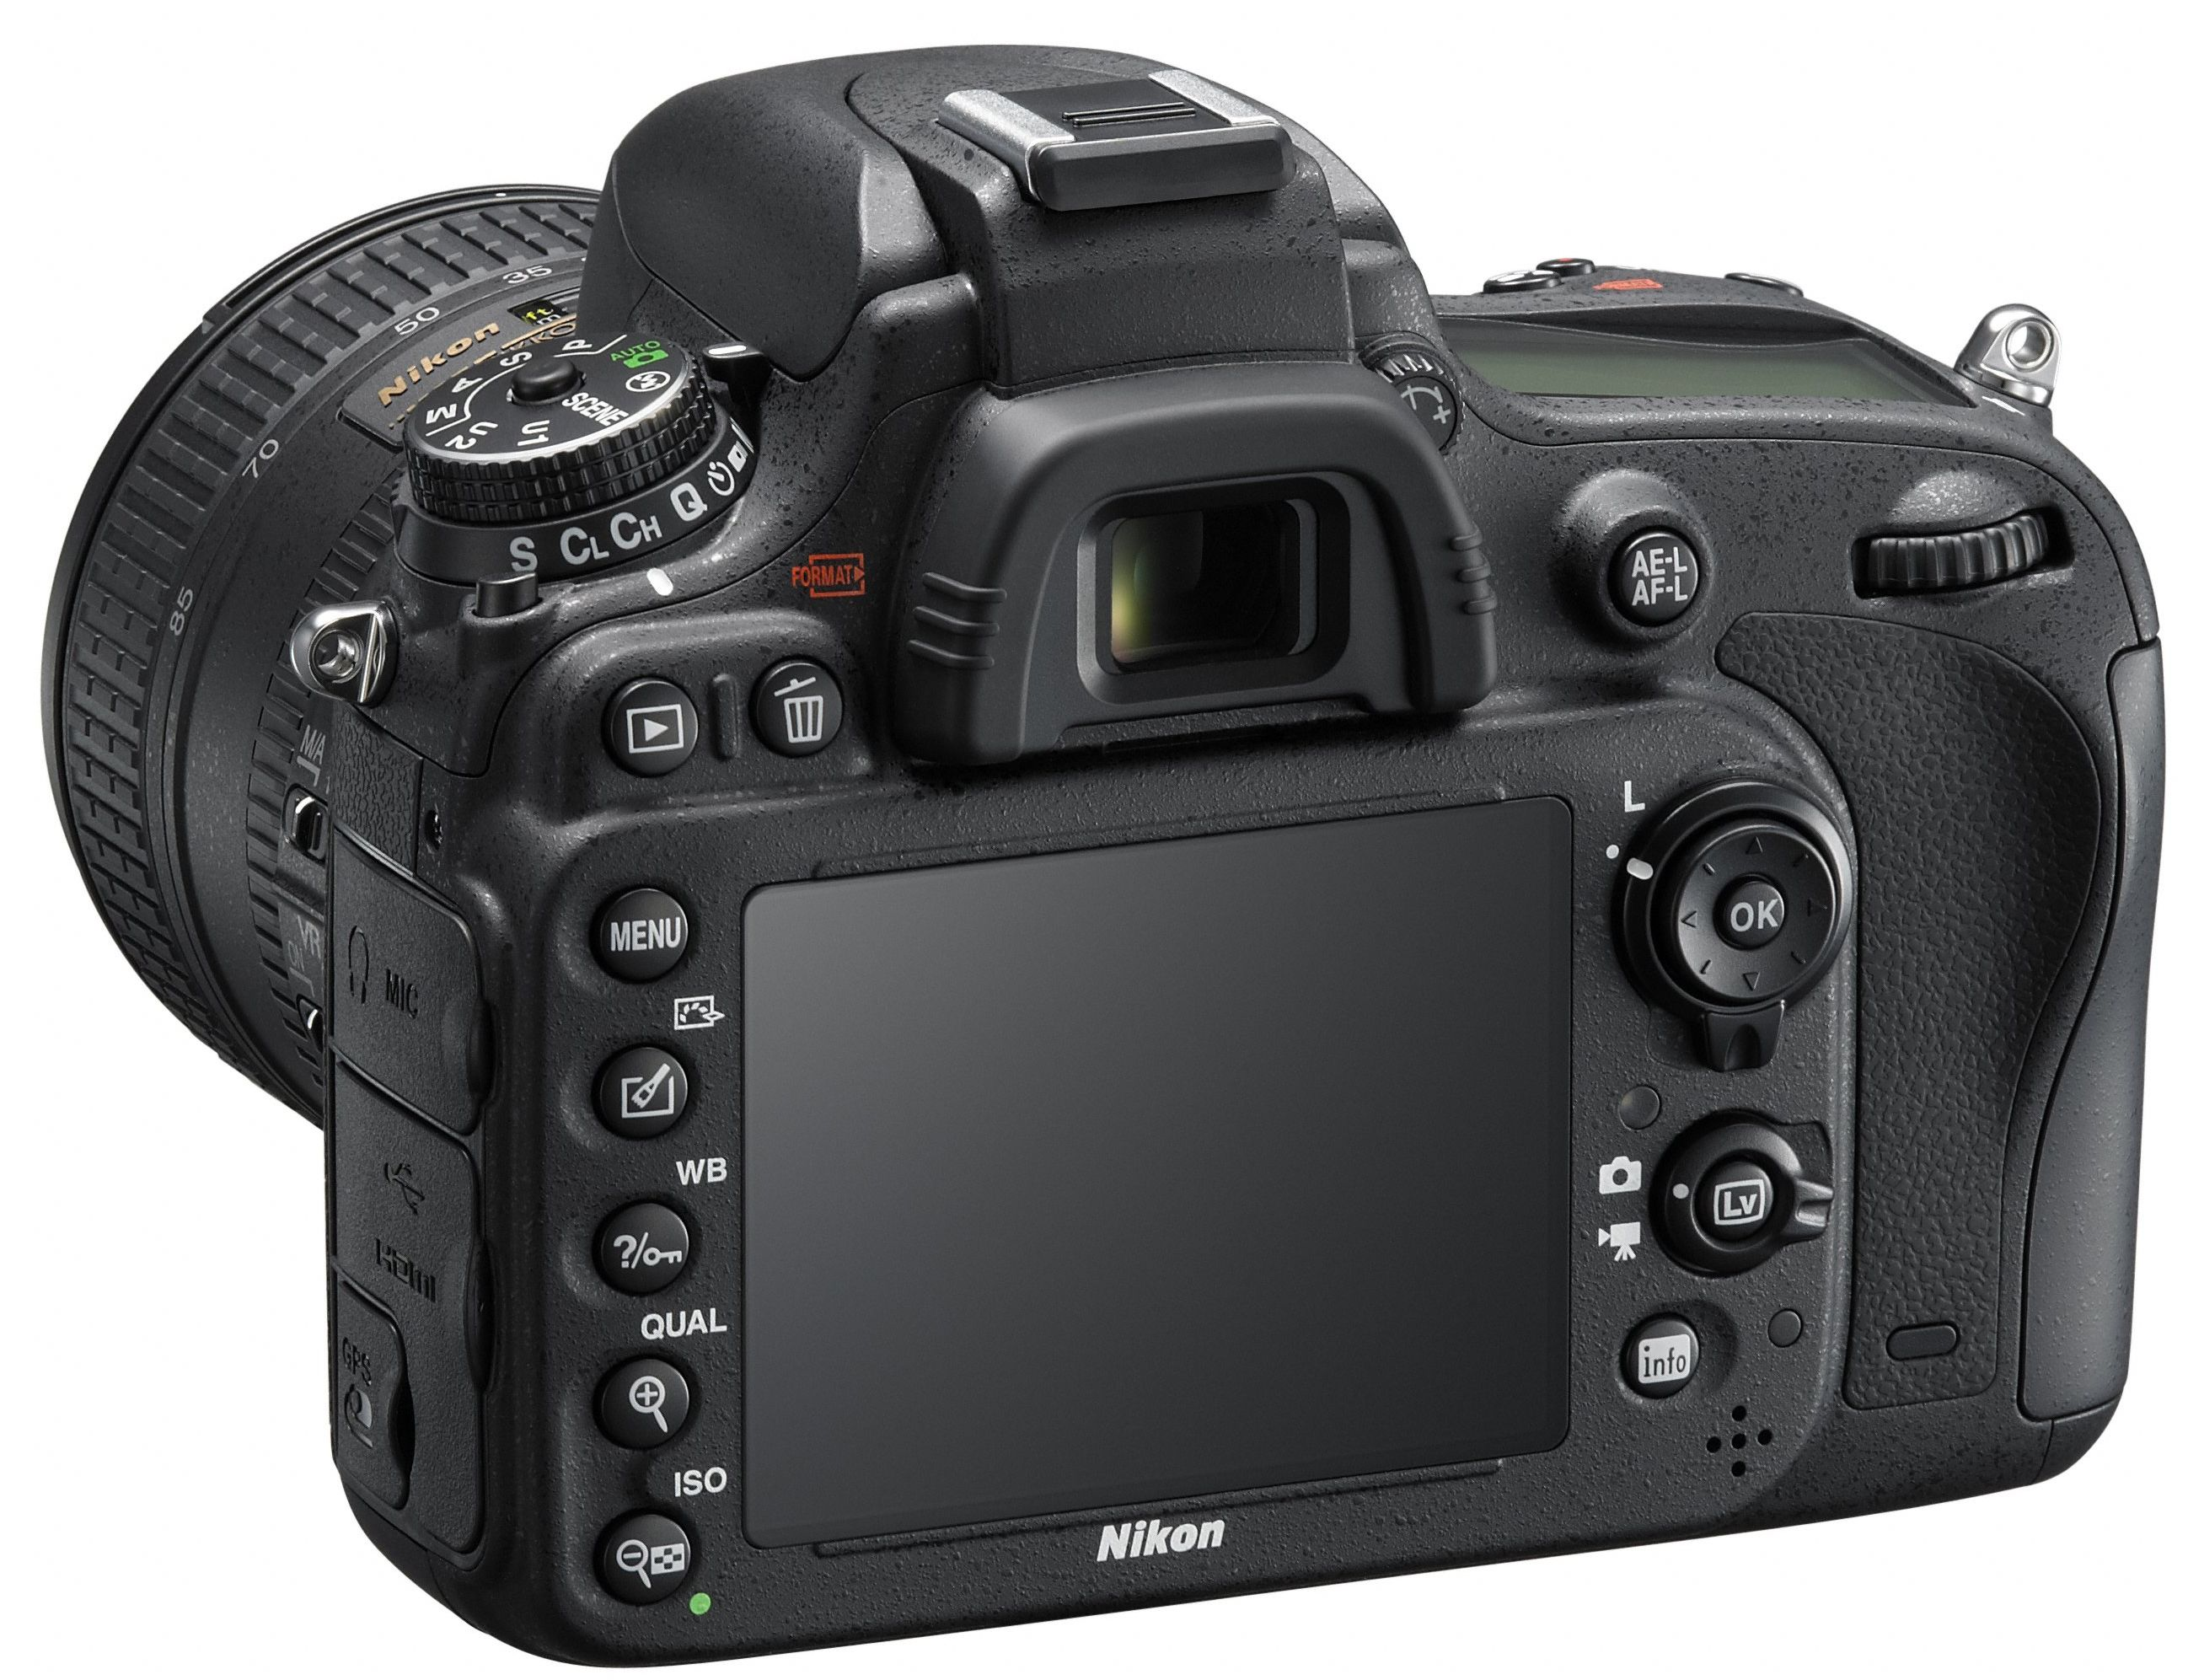 Nikon D600 Nikon D7100 Video Camara Nikon